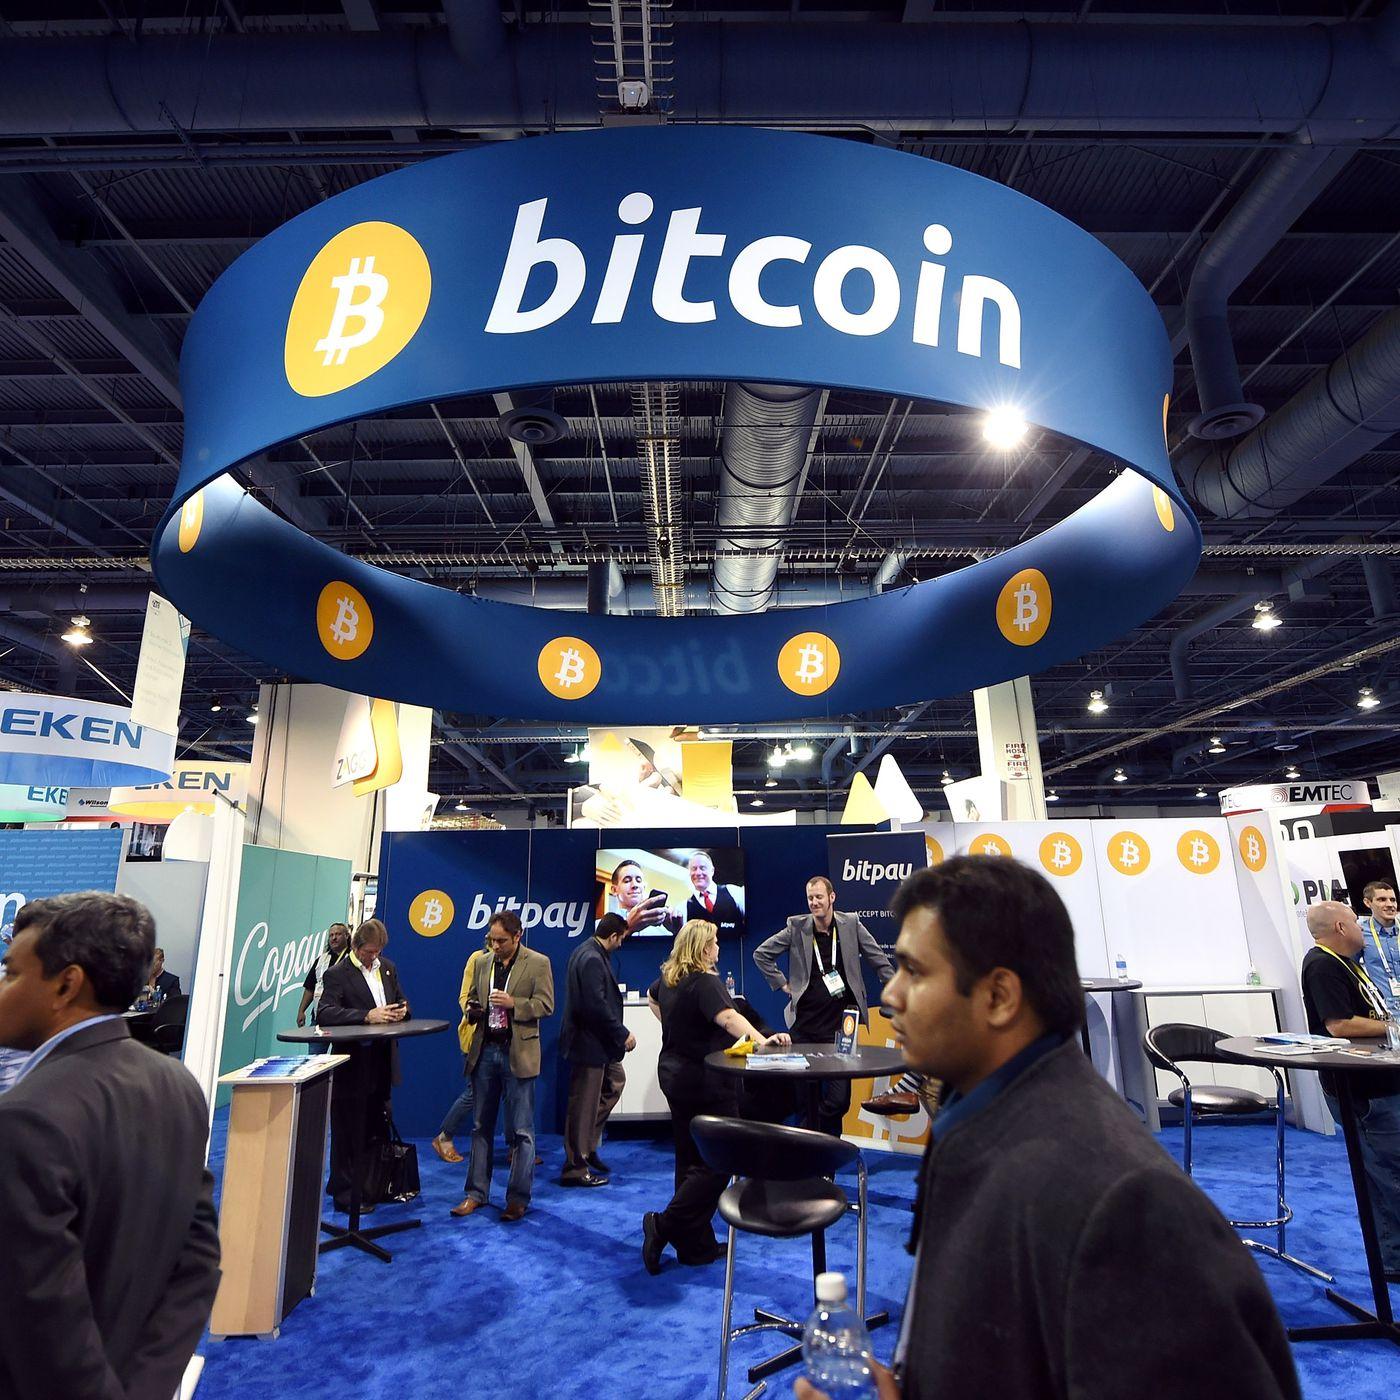 matonis bitcoin cryptocurrency arbitrage reddit